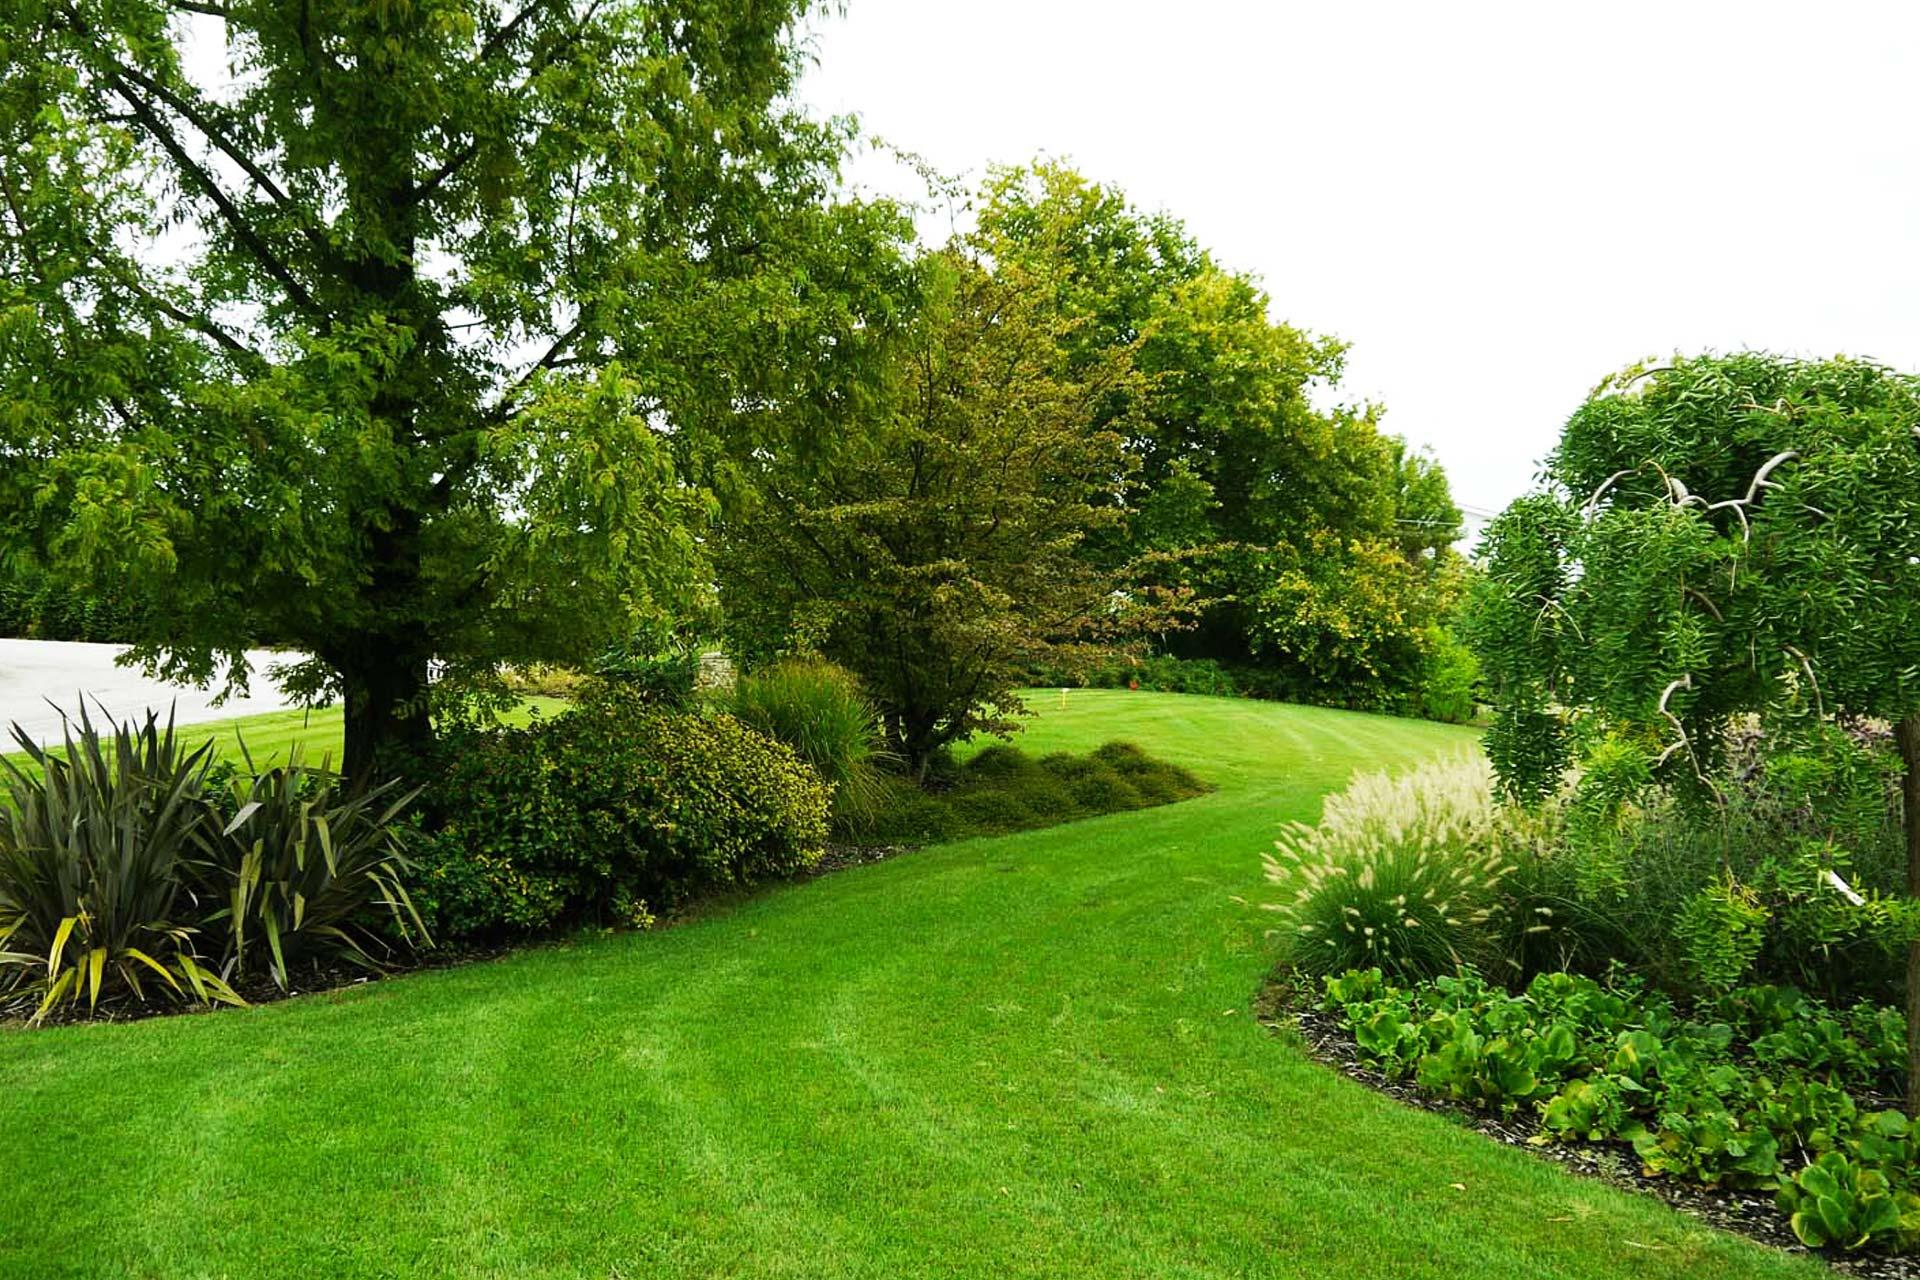 foto-dettaglio-giardino-con-aiuola-bis